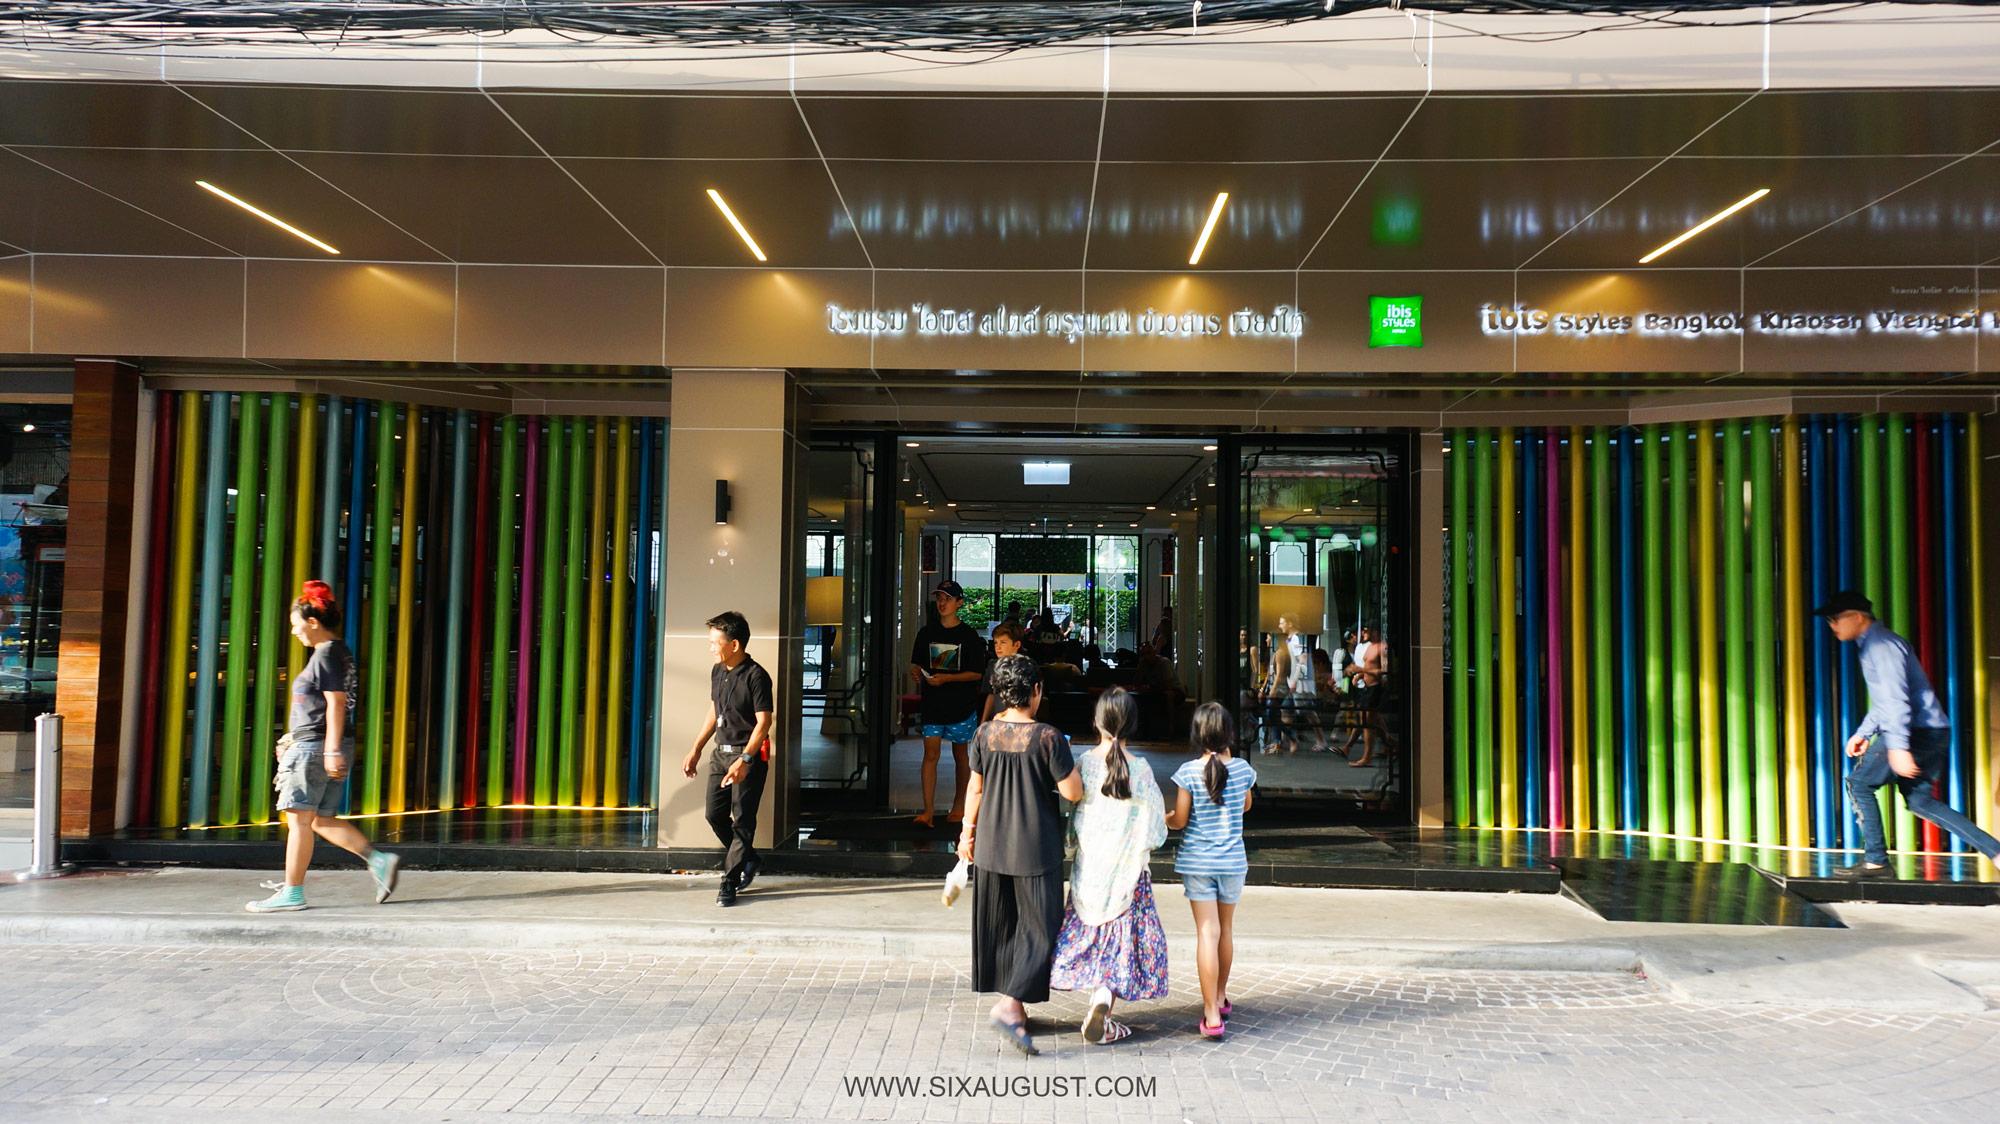 IBIS STYLES Bangkok Khaosan Viengta